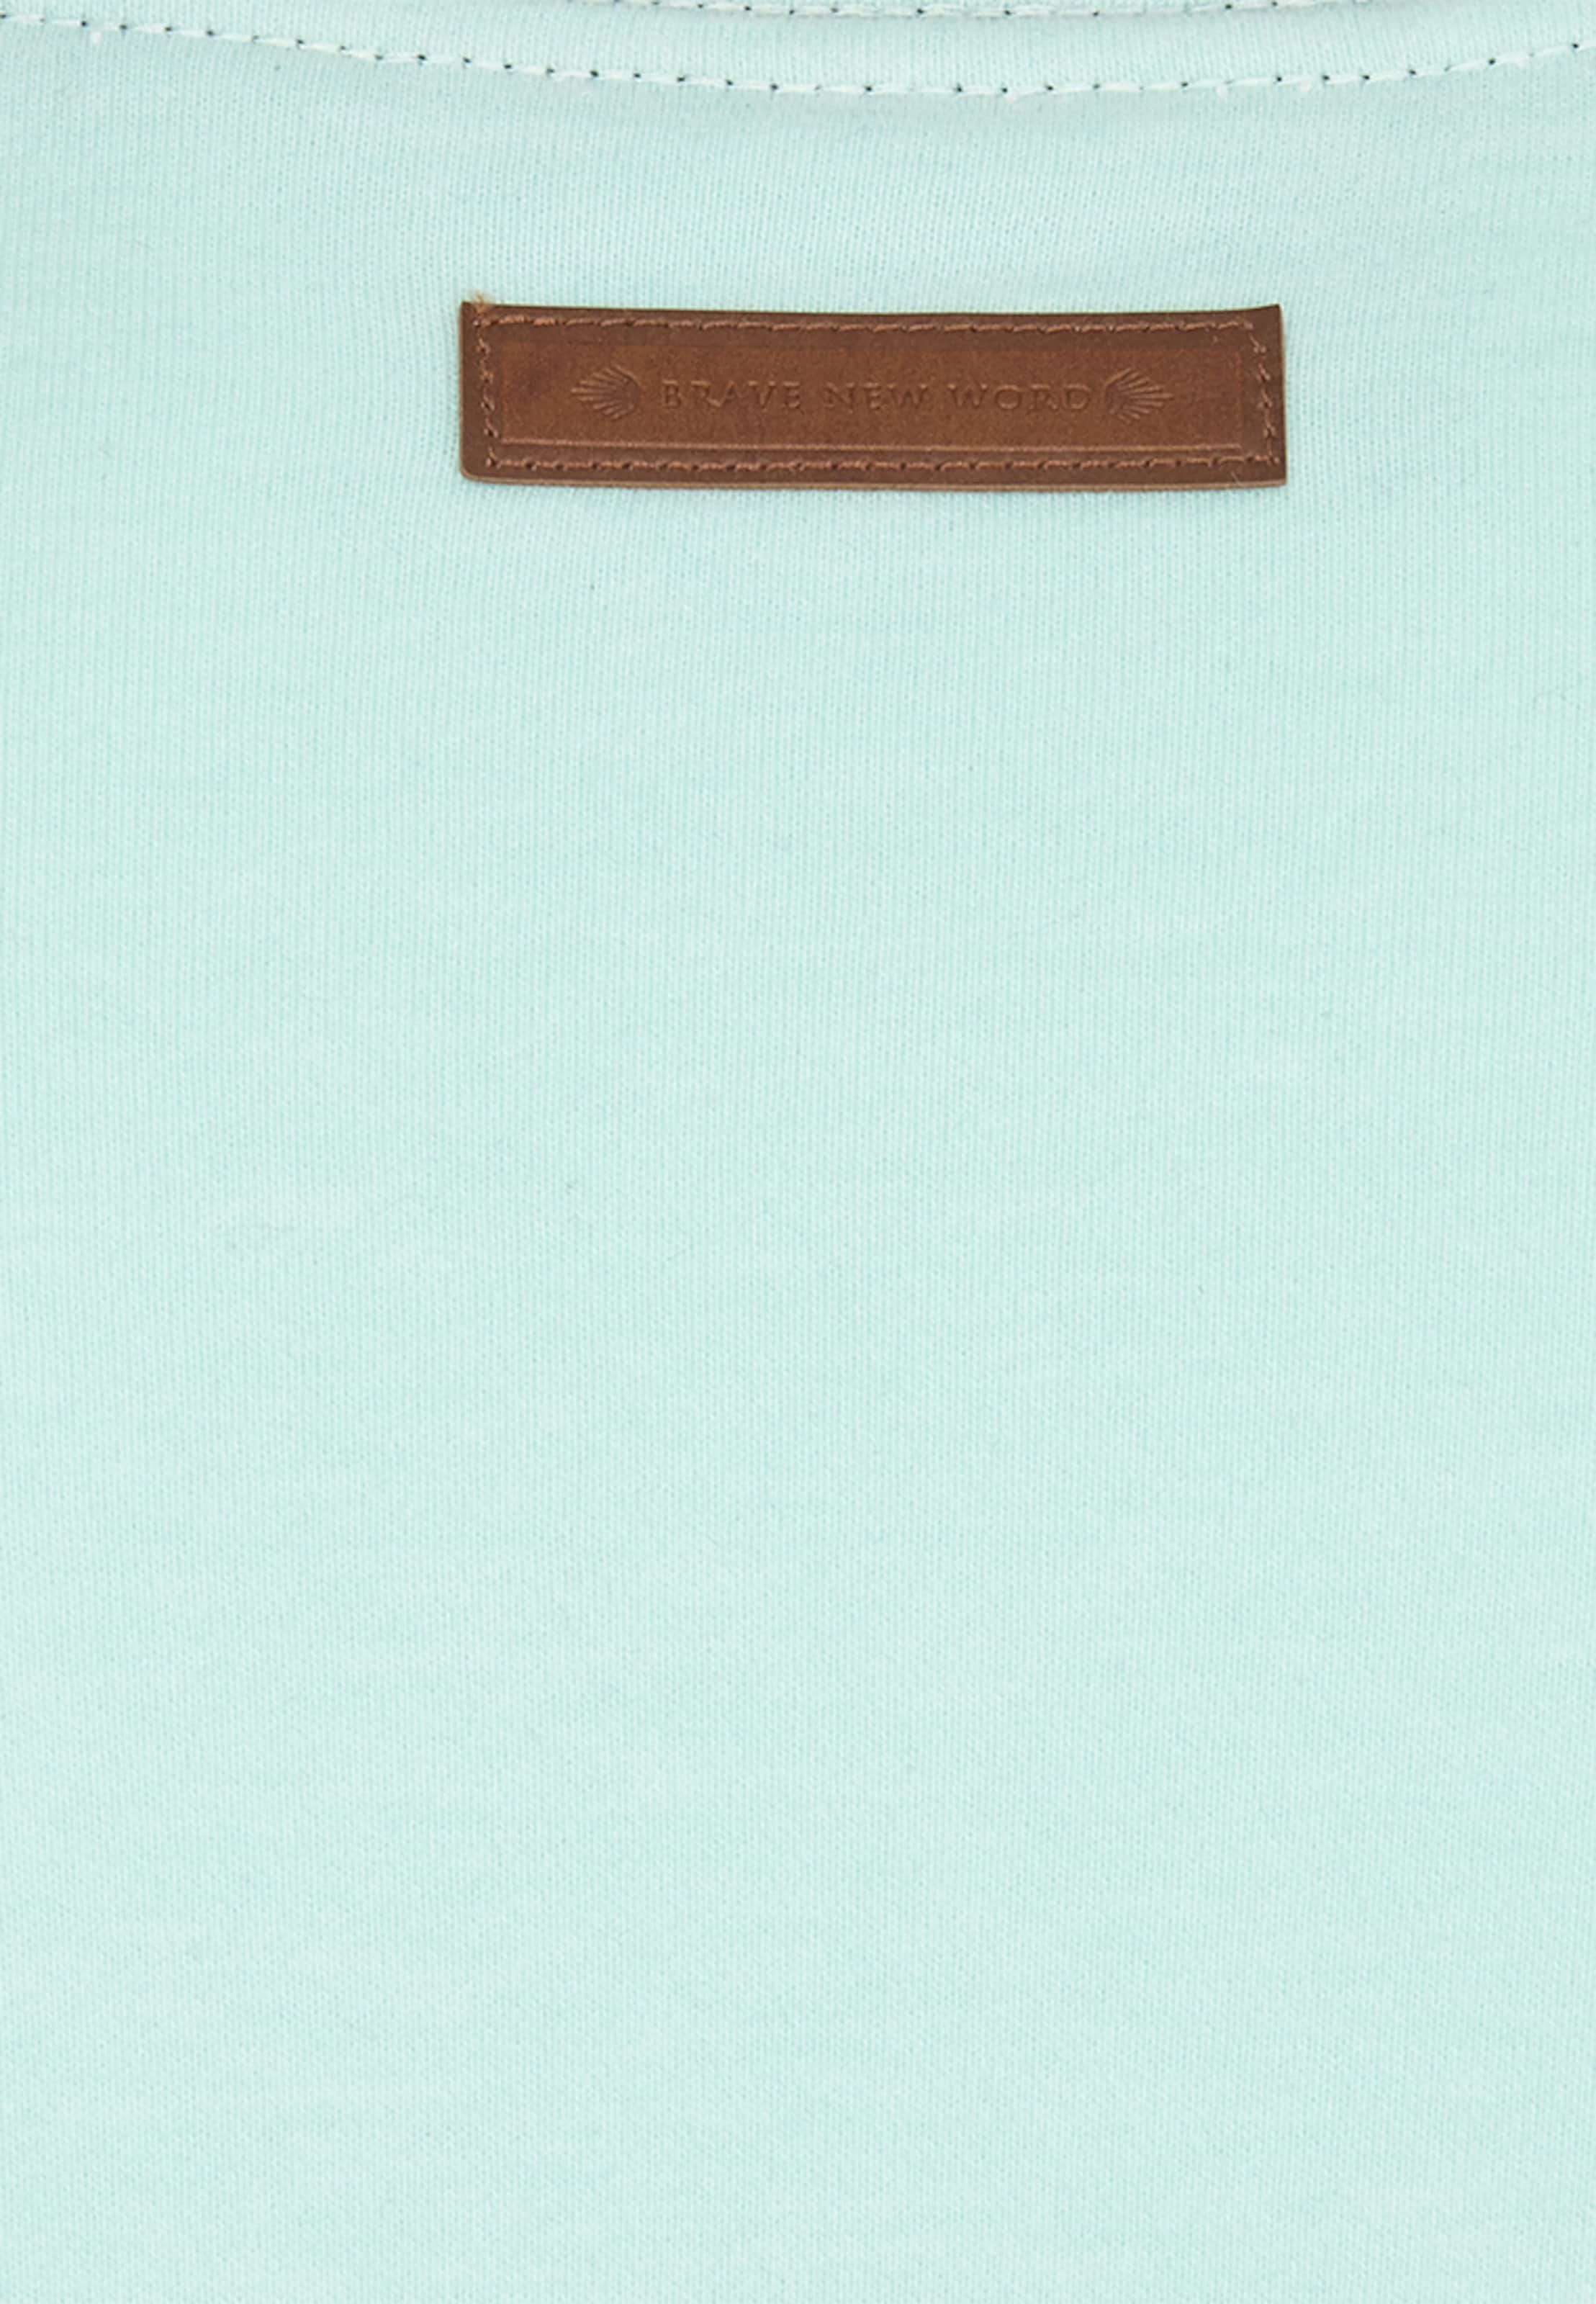 naketano Sweatshirt 'Kubilay VI' Erhalten Authentisch Zu Verkaufen Rabatt Bester Großhandel i2N1GS8